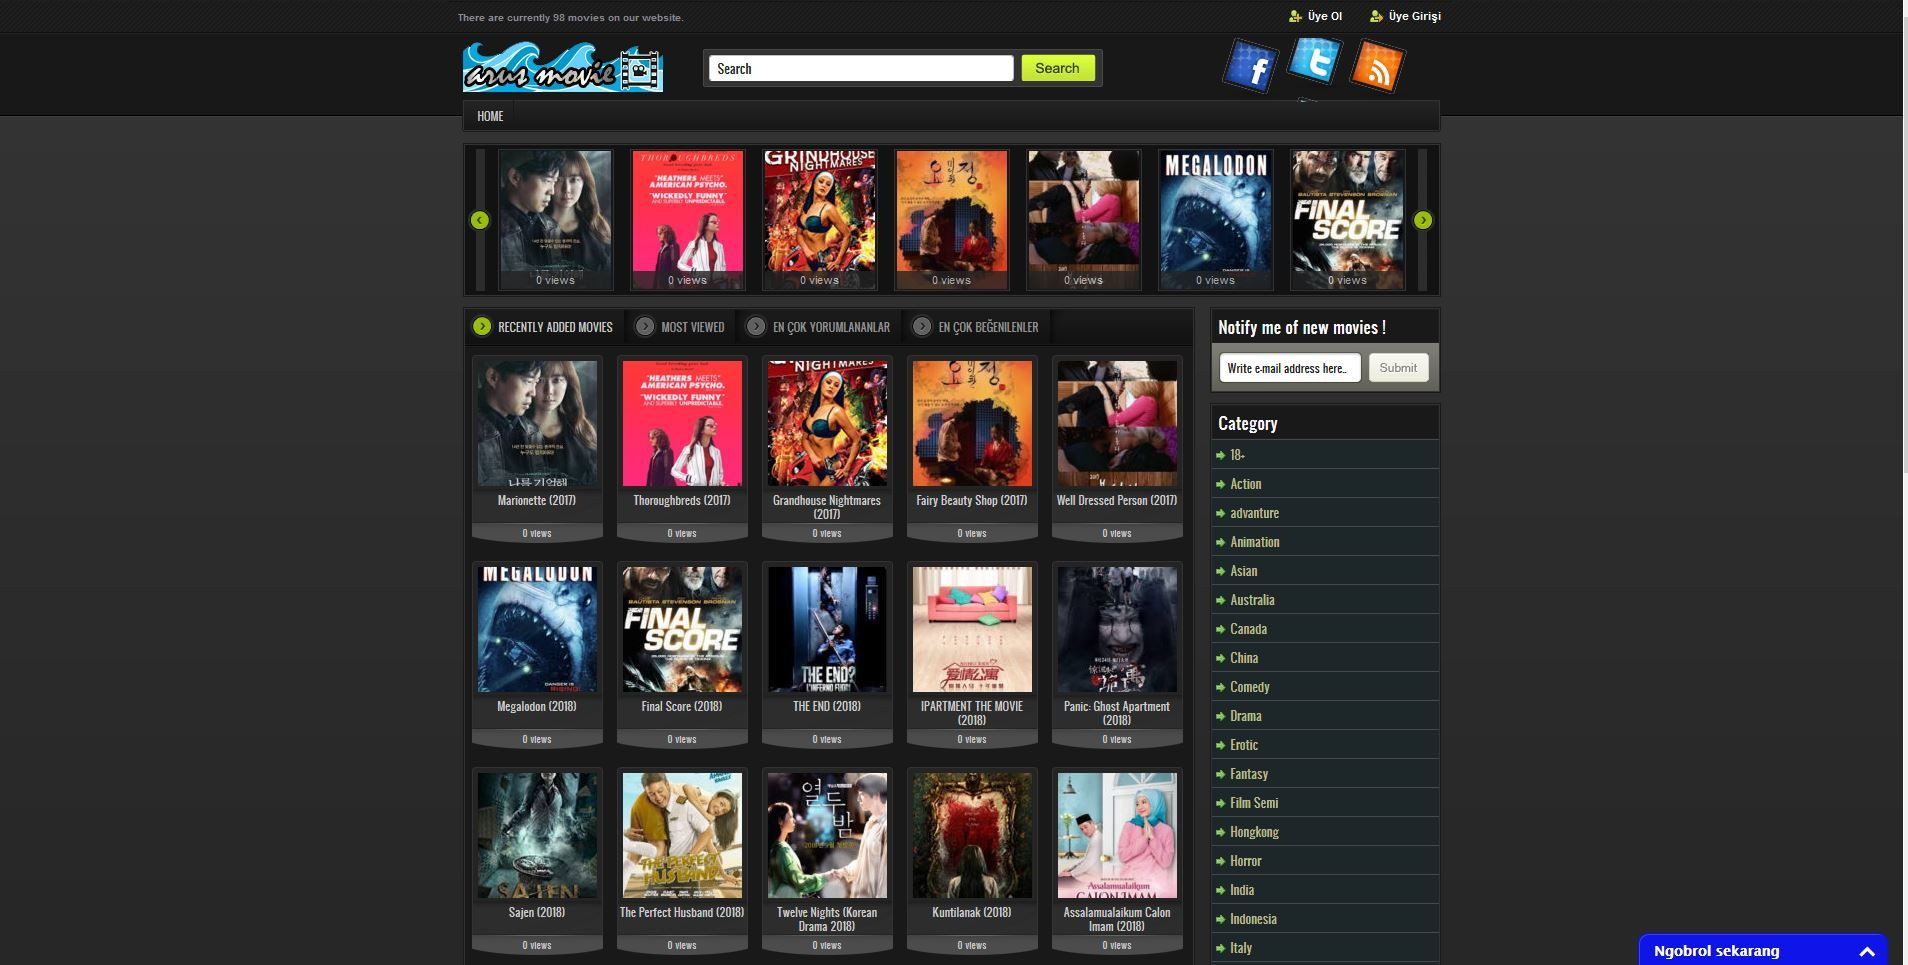 Nonton Bioskop Online Sub Indo Nonton Film Stream Box Office